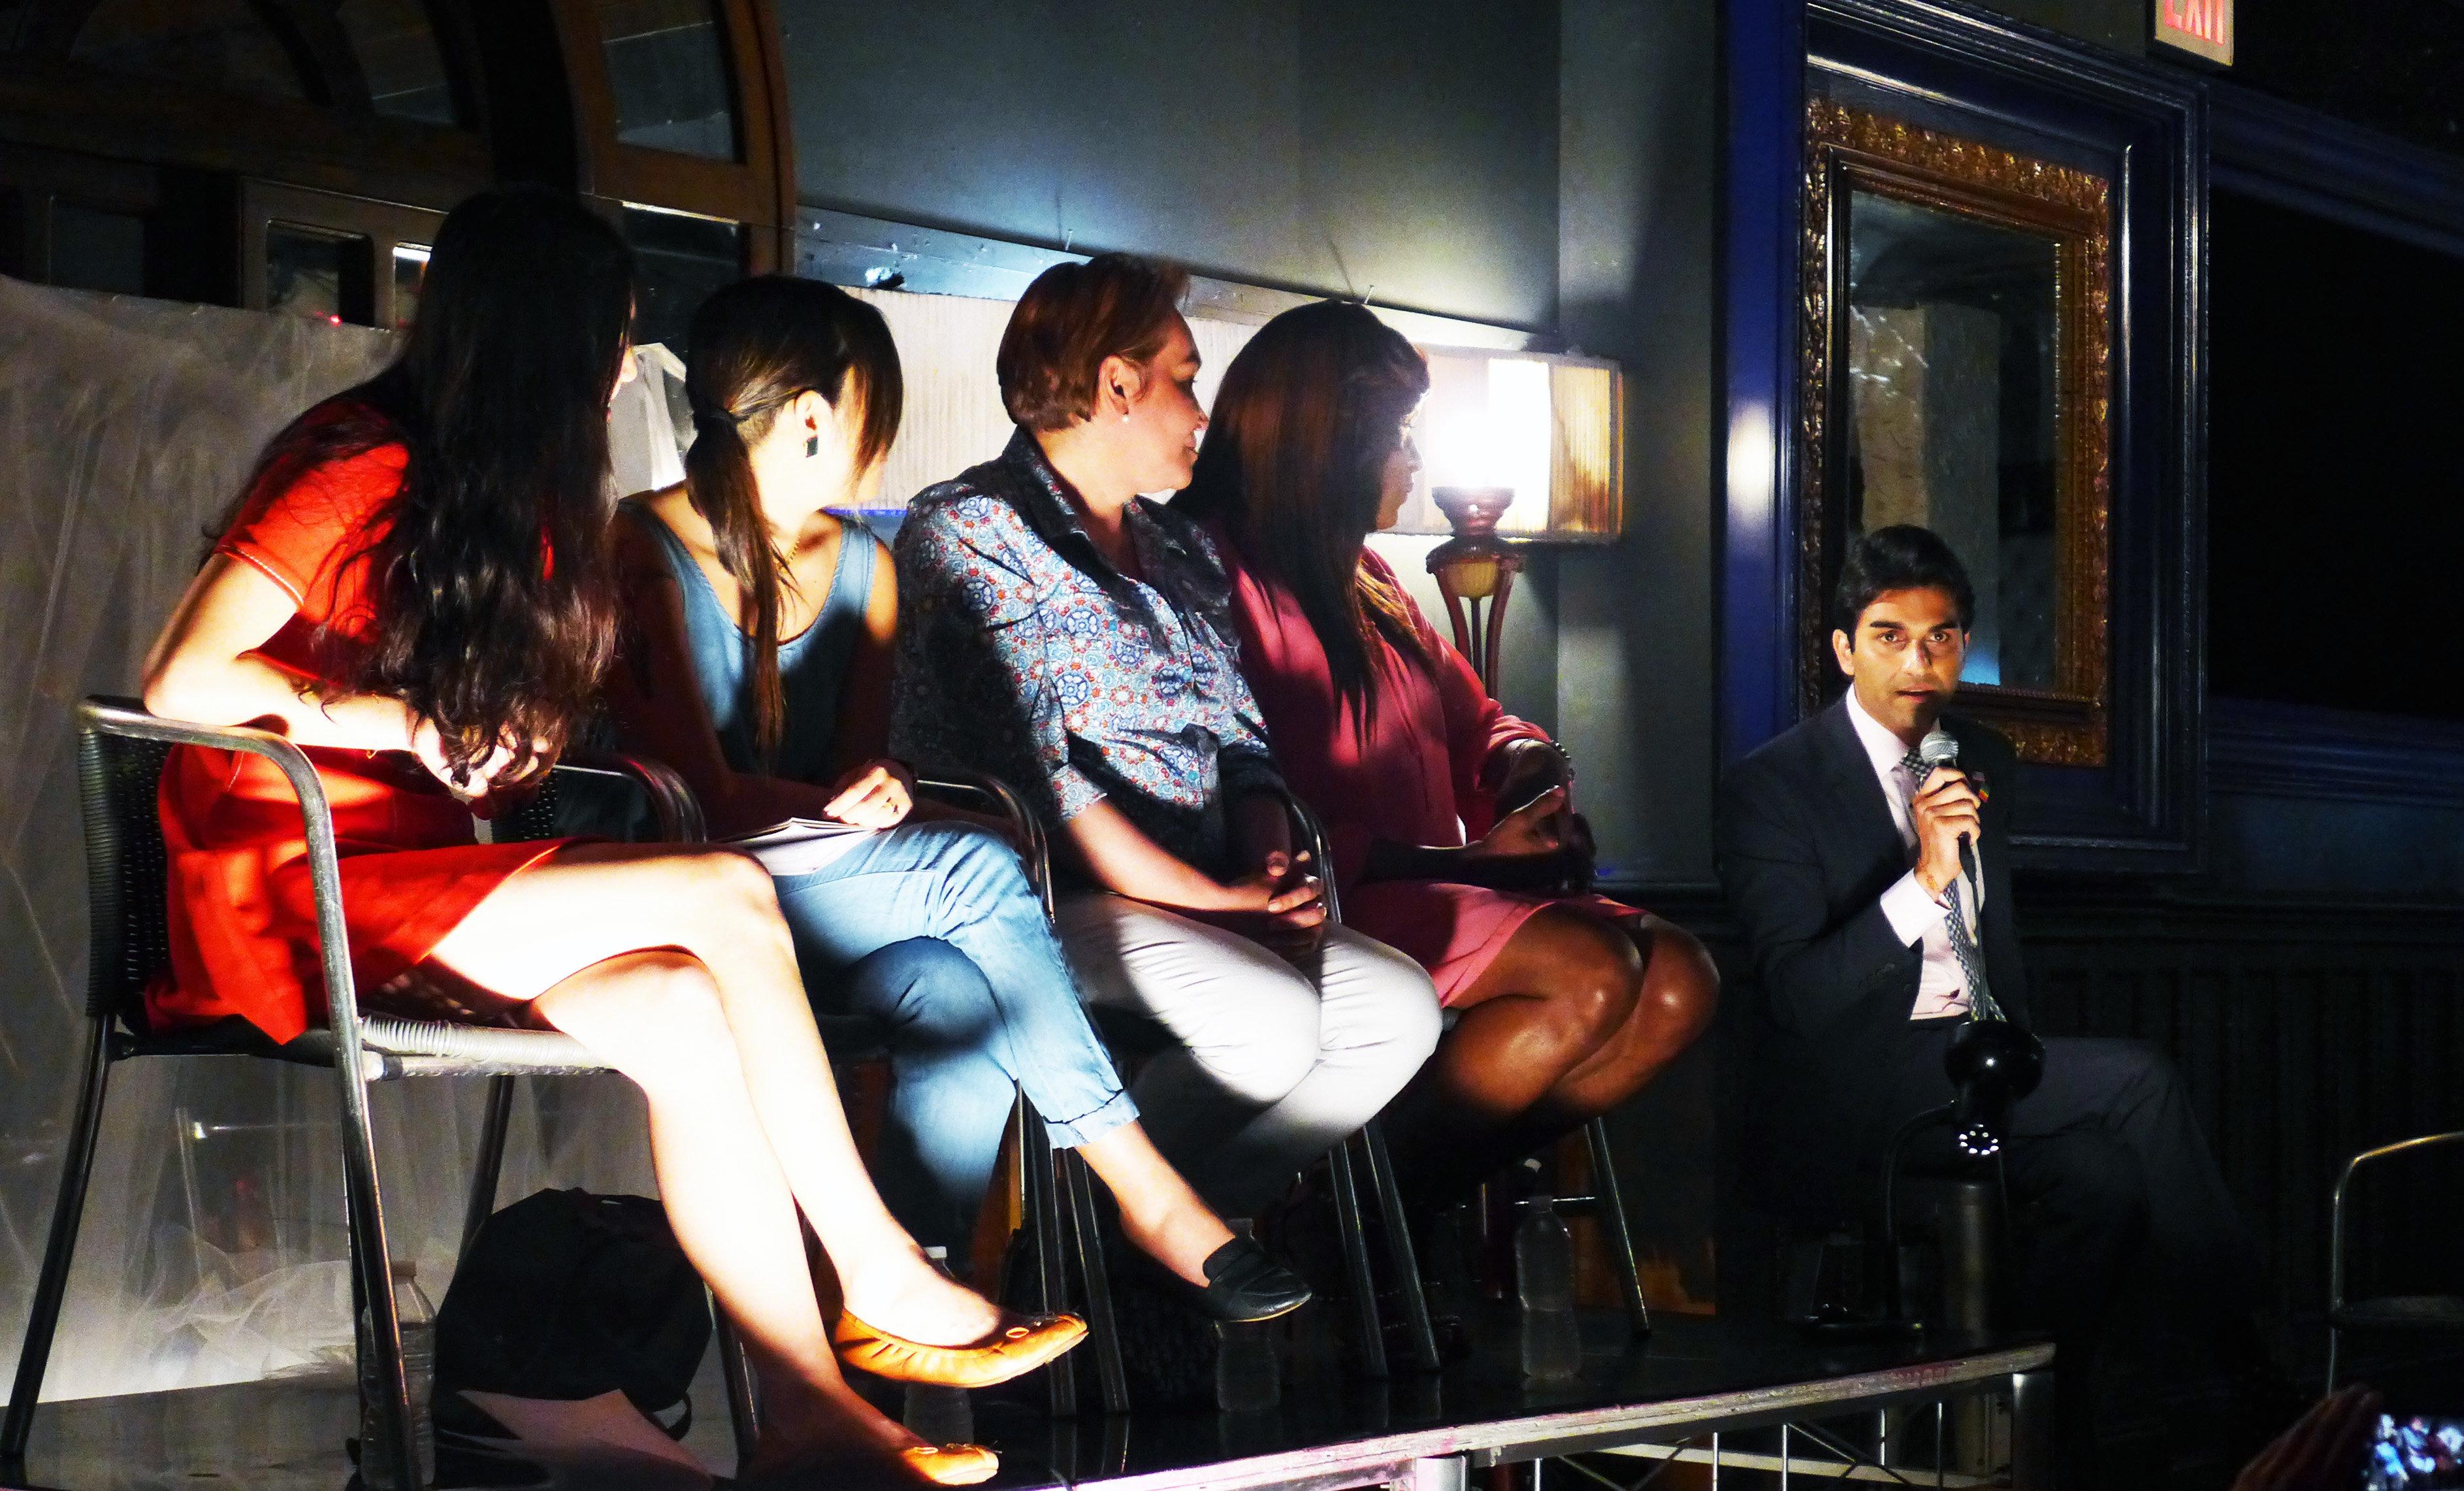 Suraj Patel (far left) speaks with activists Lola Balcon, Aya Tasaki Cecilia Gentili, and Ceyenne Doroshow on Saturday in Bro